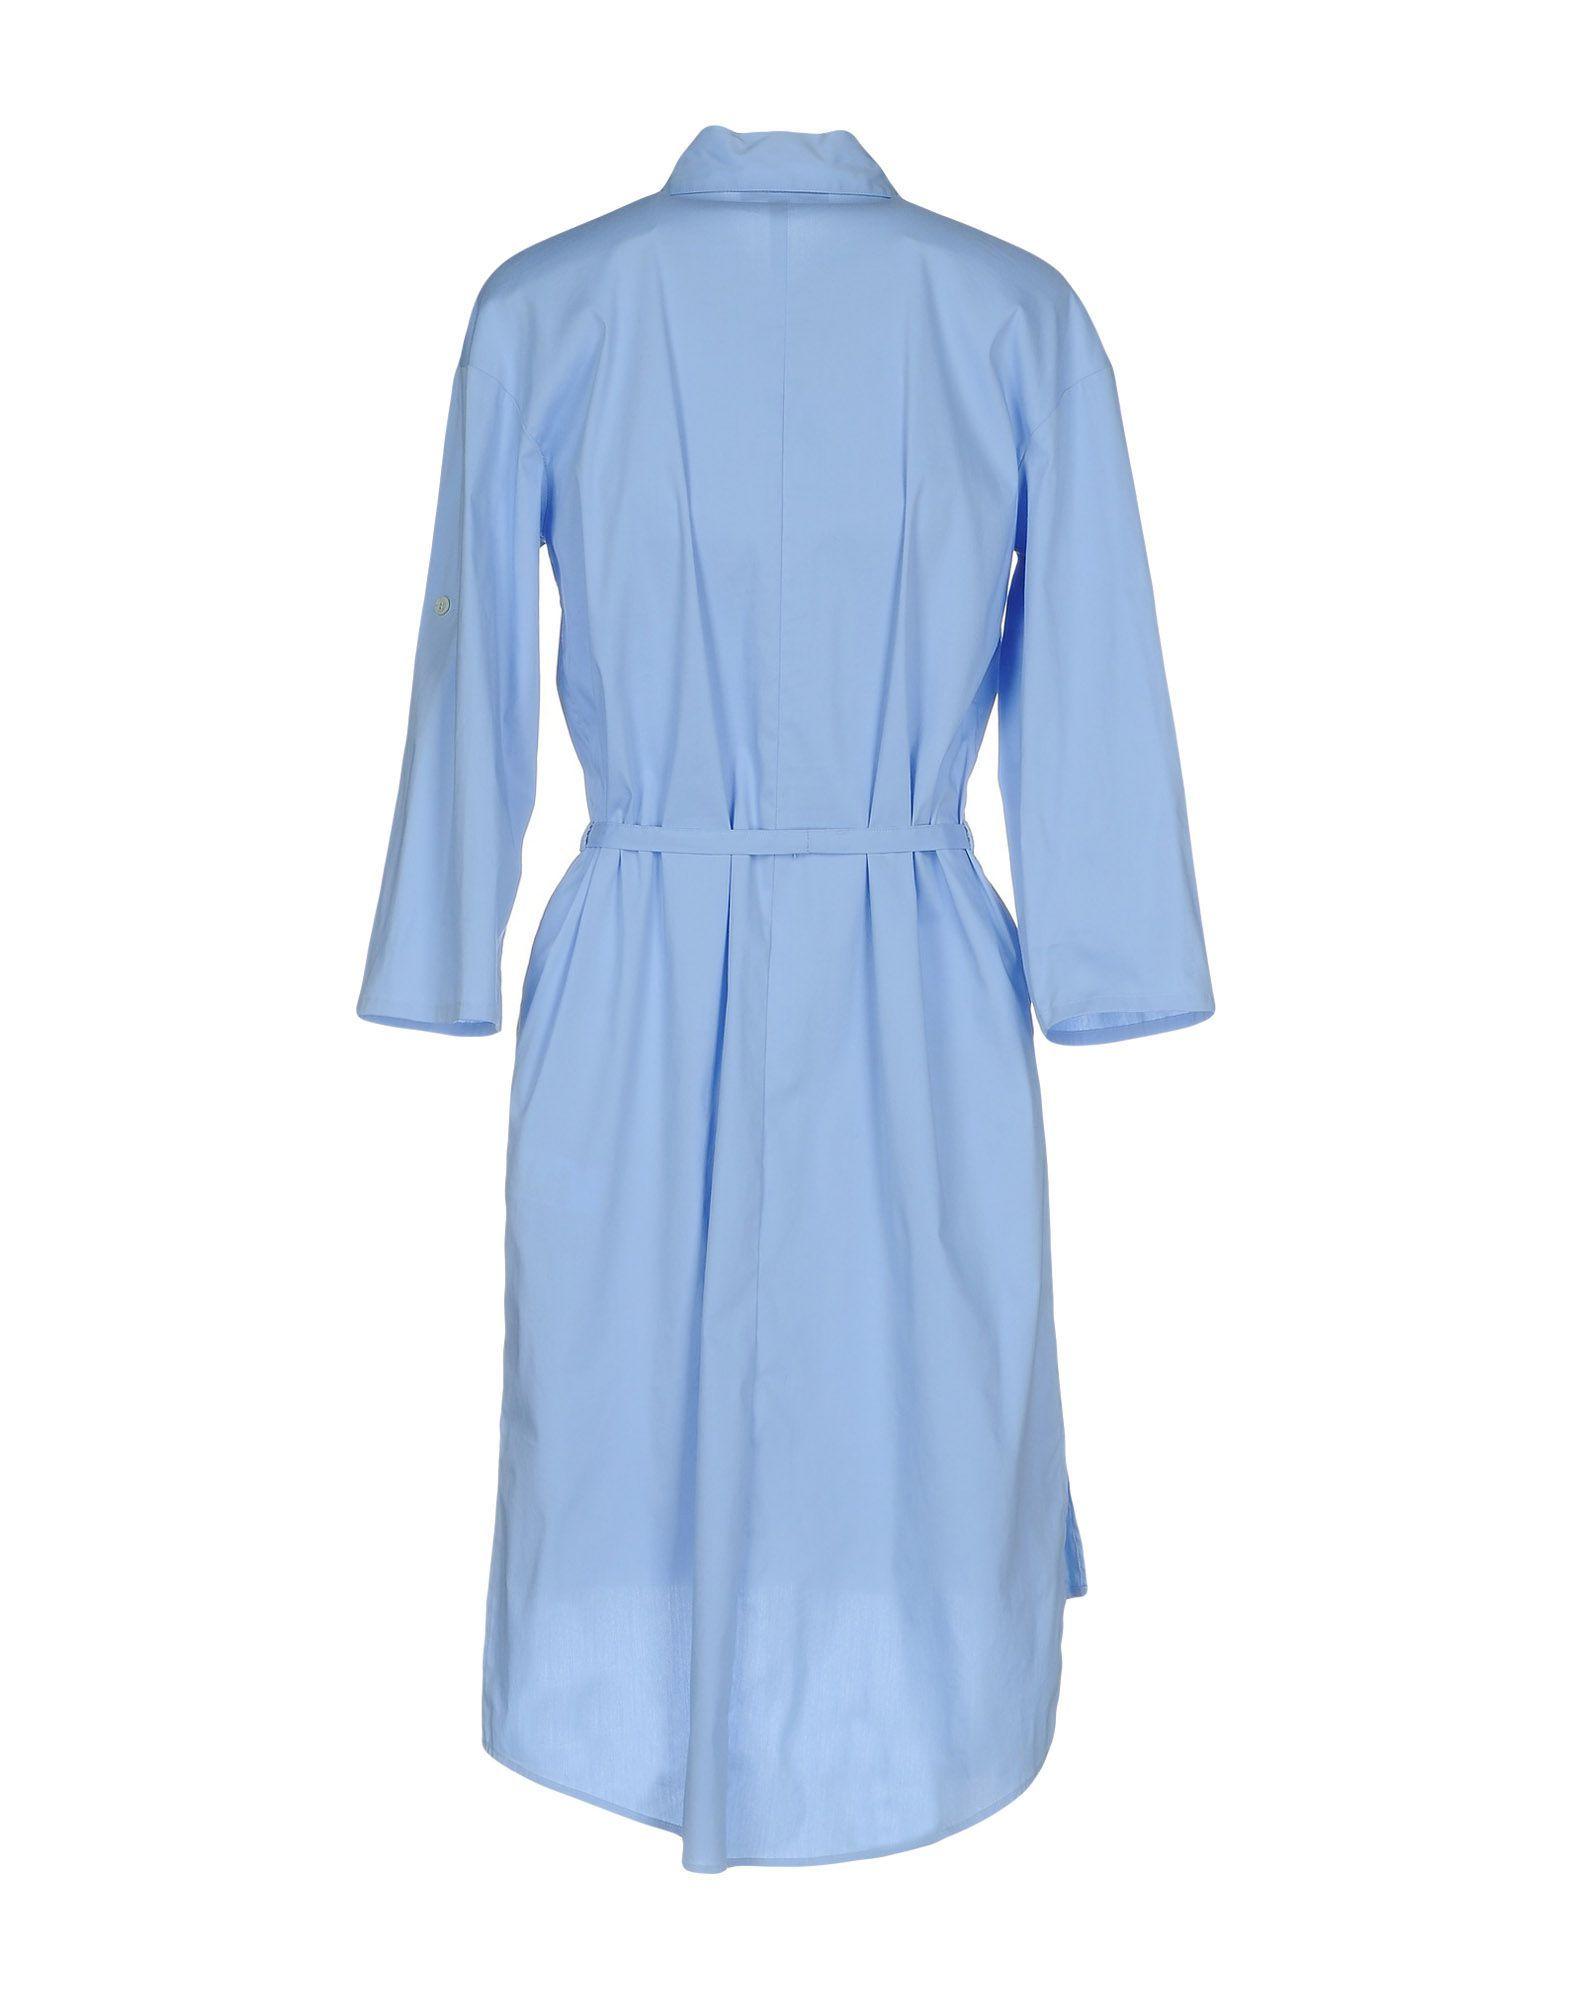 Patrizia Pepe Sky Blue Cotton Shirt Dress